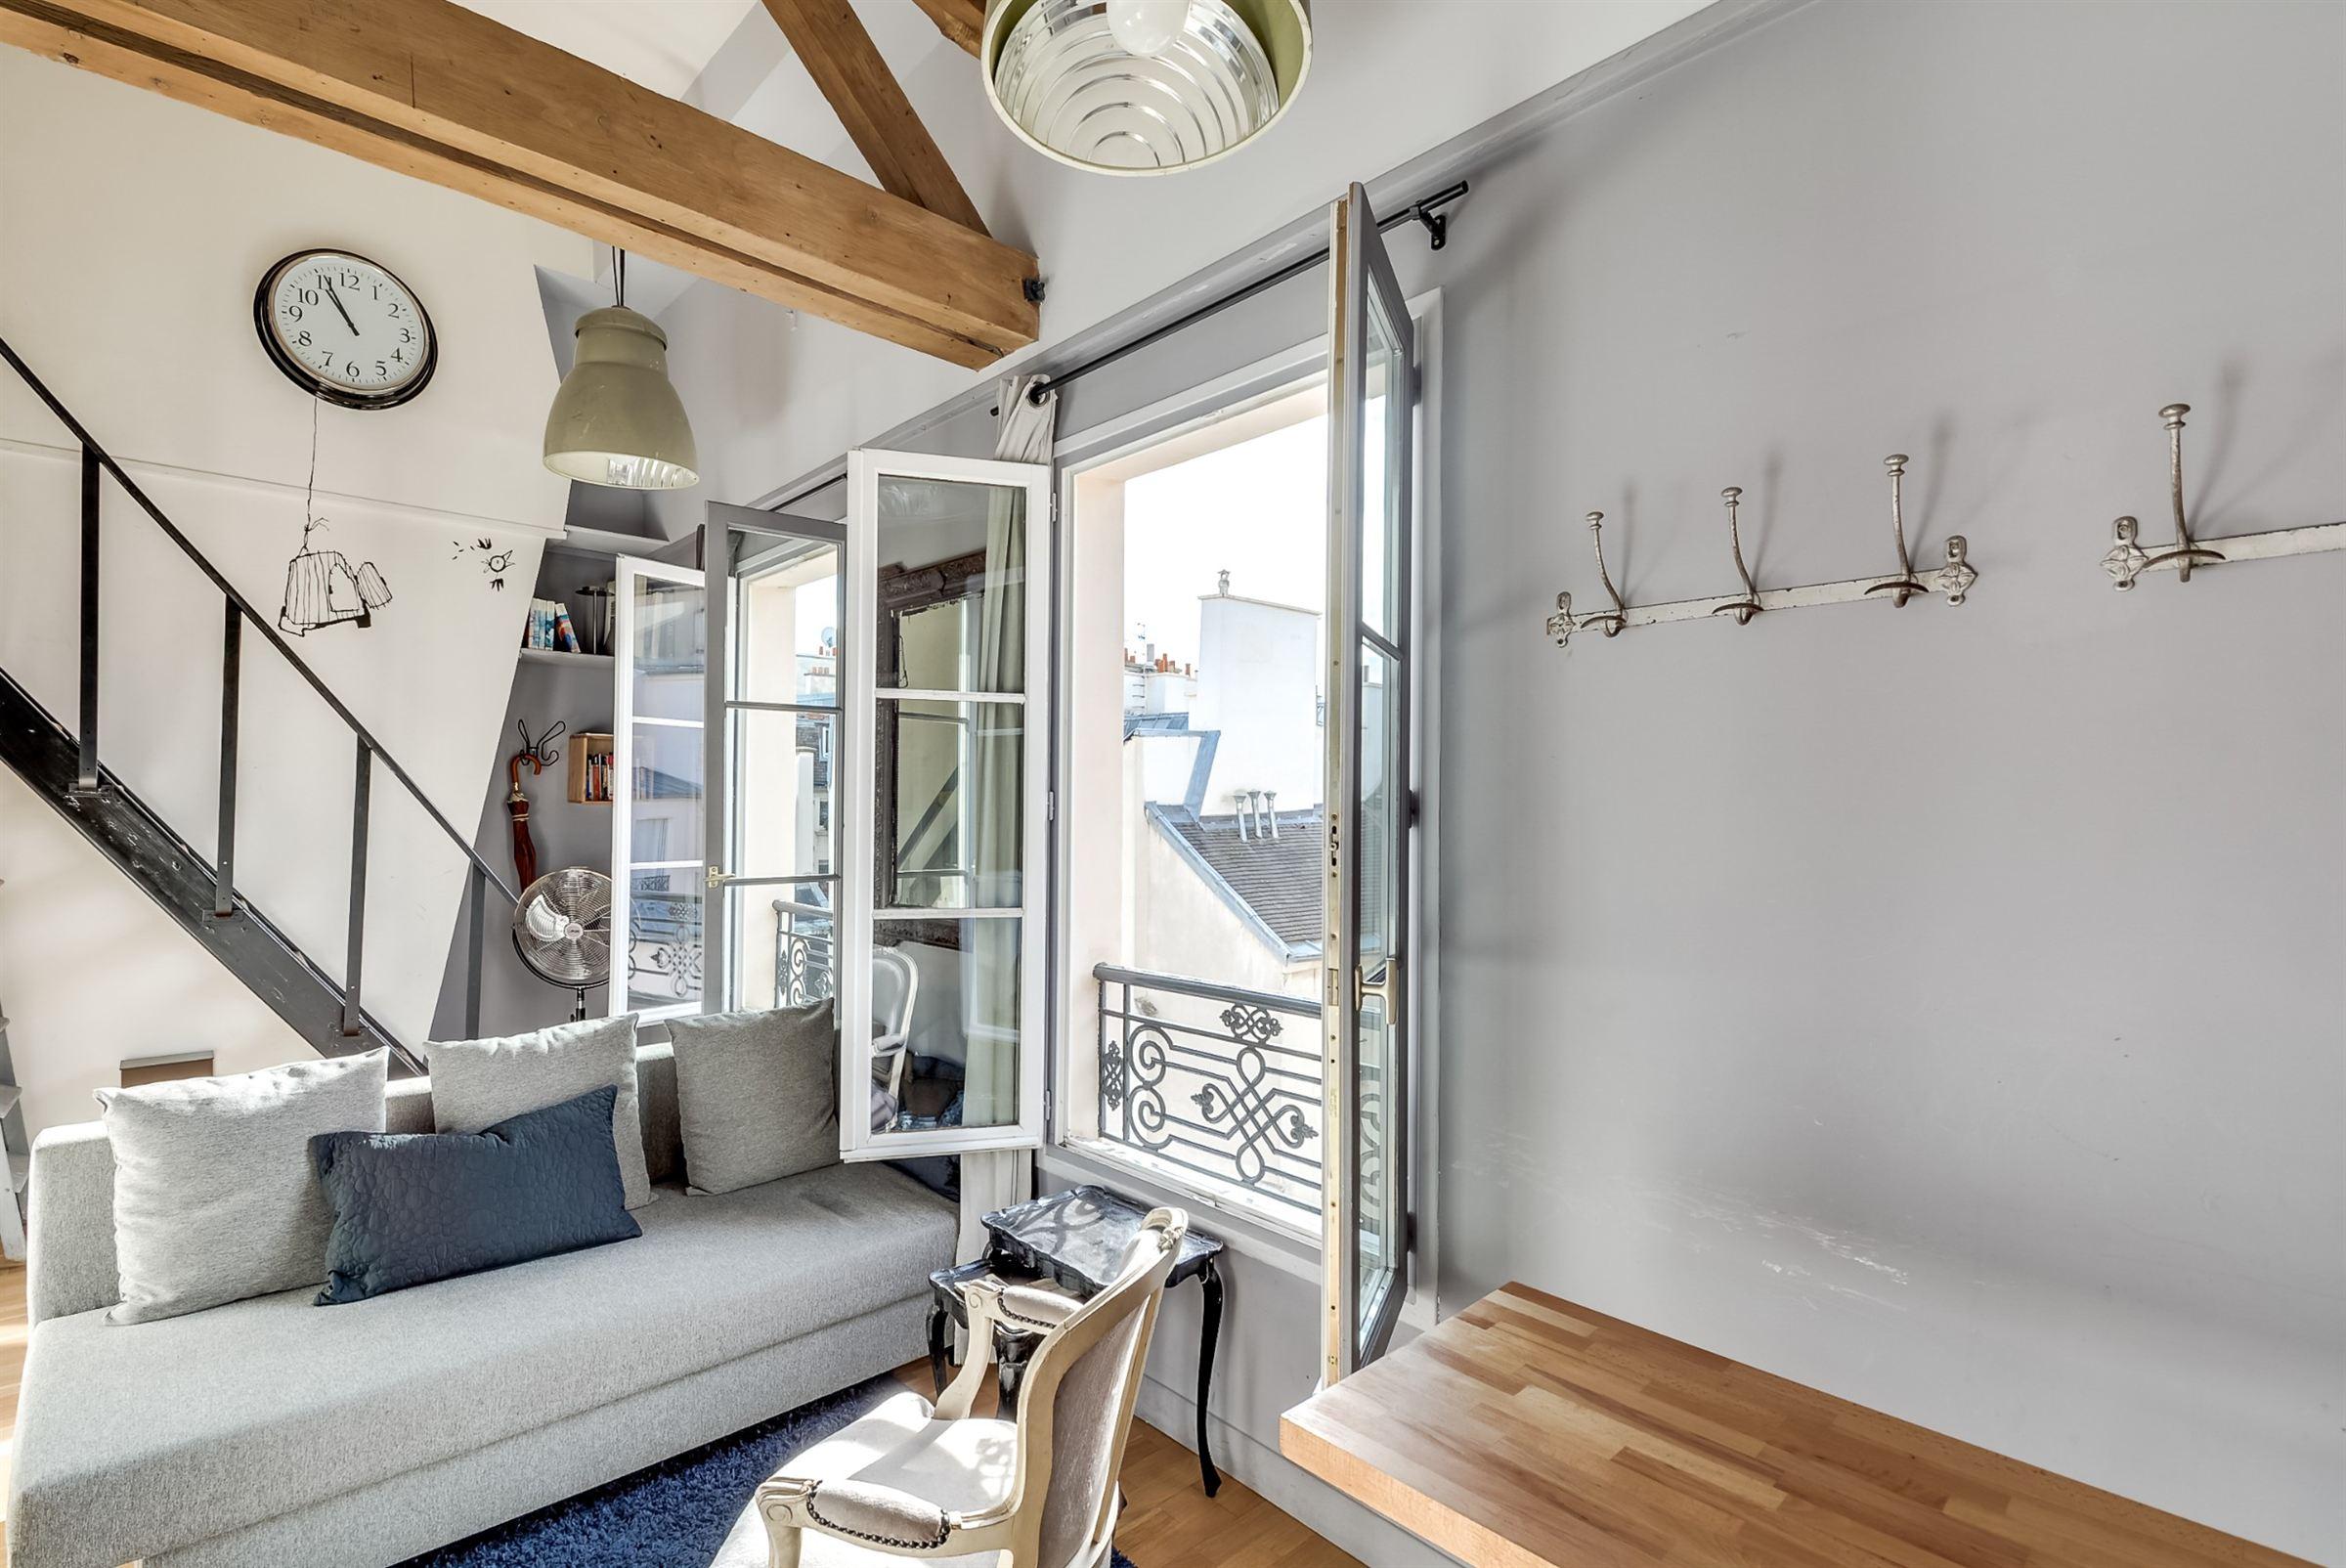 Apartamento por un Venta en Paris 4 - Ile St Louis. Duplex, top floor. Lots of charm Paris, Paris, 75004 Francia